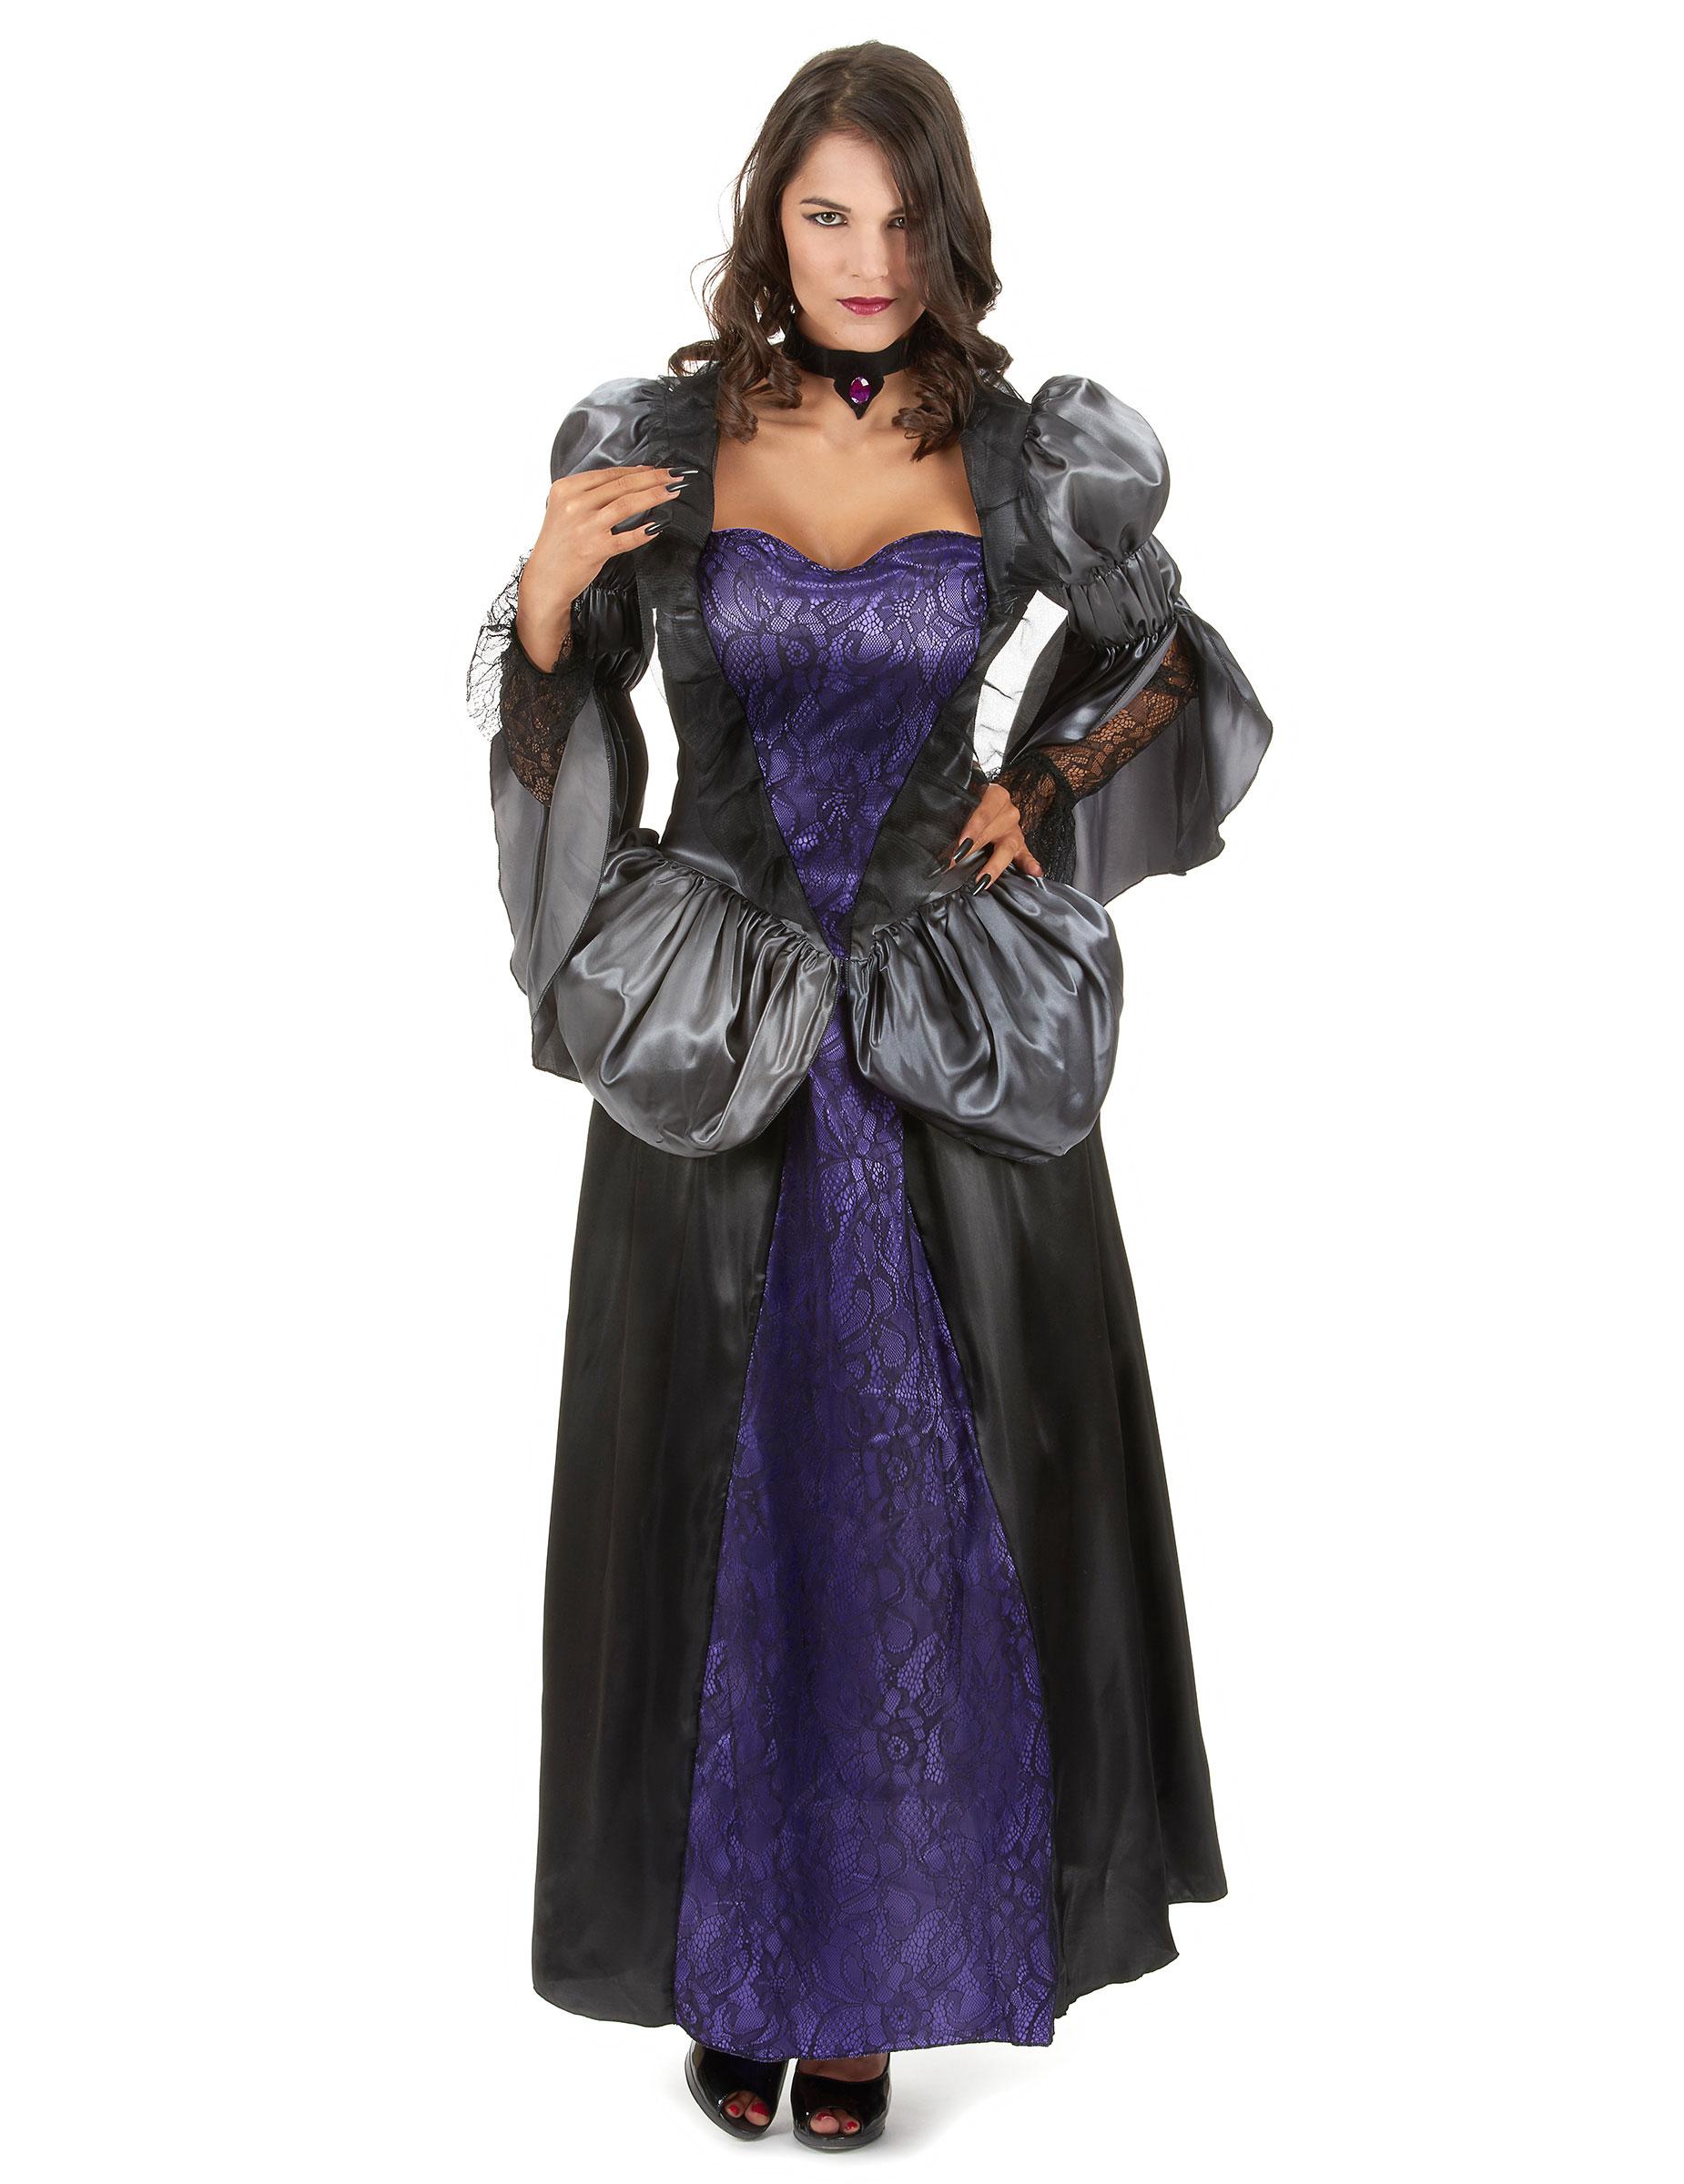 vampire countess costume - HD1850×2400